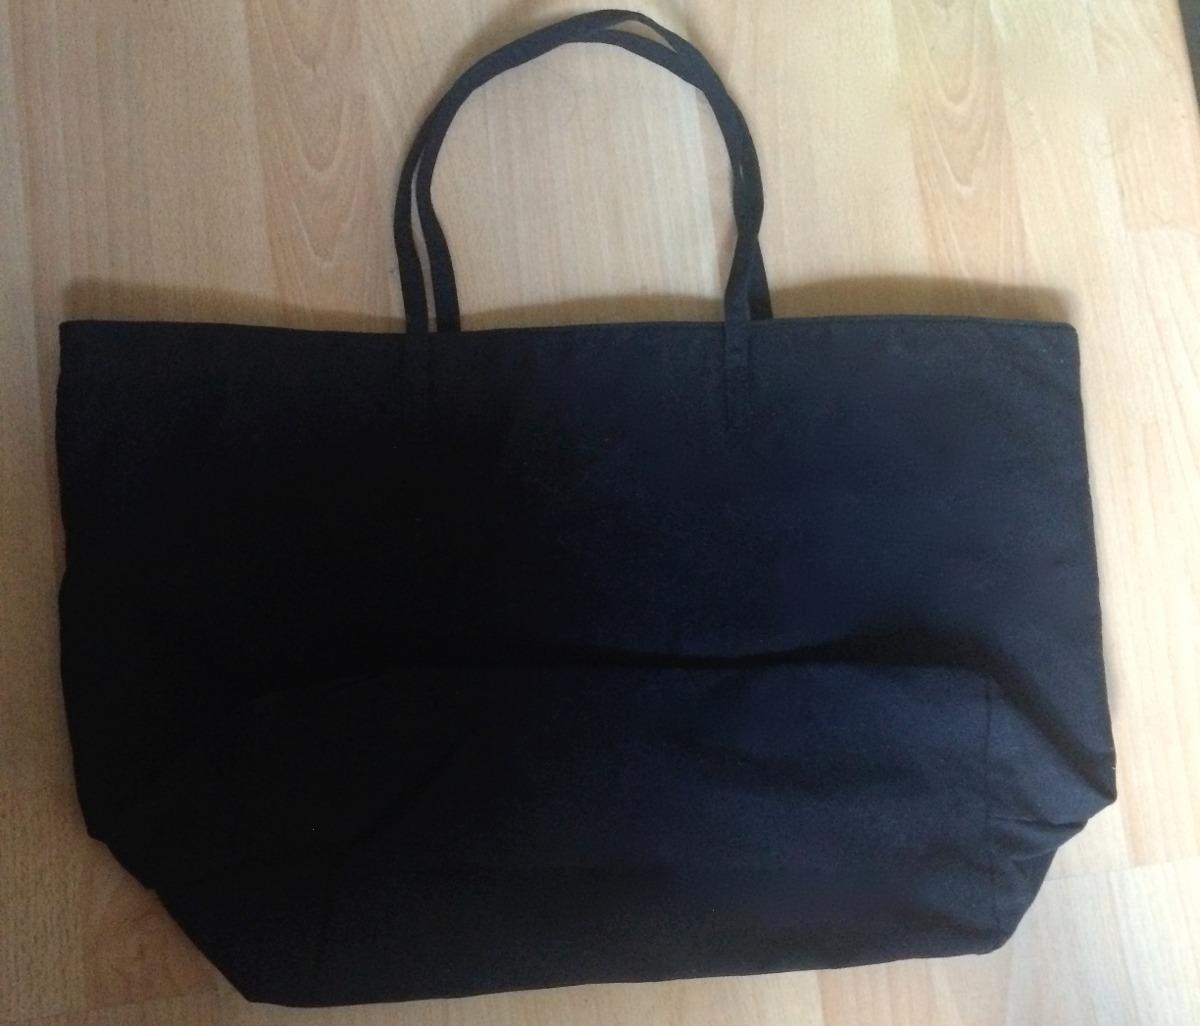 Bolsa Dourada Victoria Secrets : Bolsa maleta victoria s secret negra pink ribbon grande